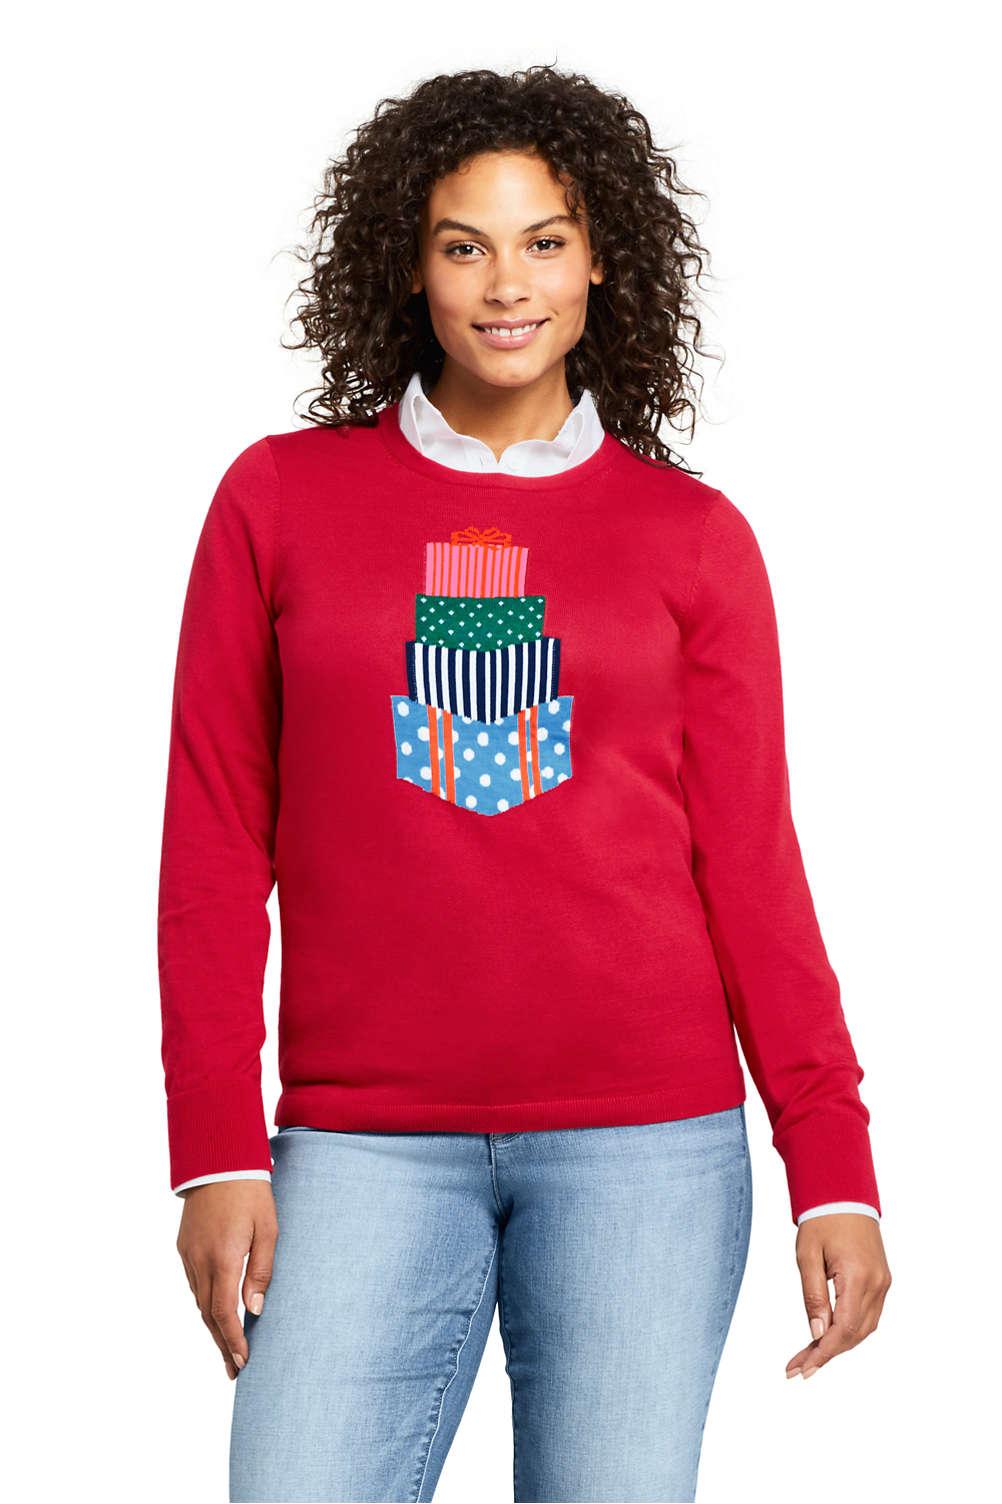 Womens Christmas Sweaters.Women S Supima Cotton Christmas Sweater